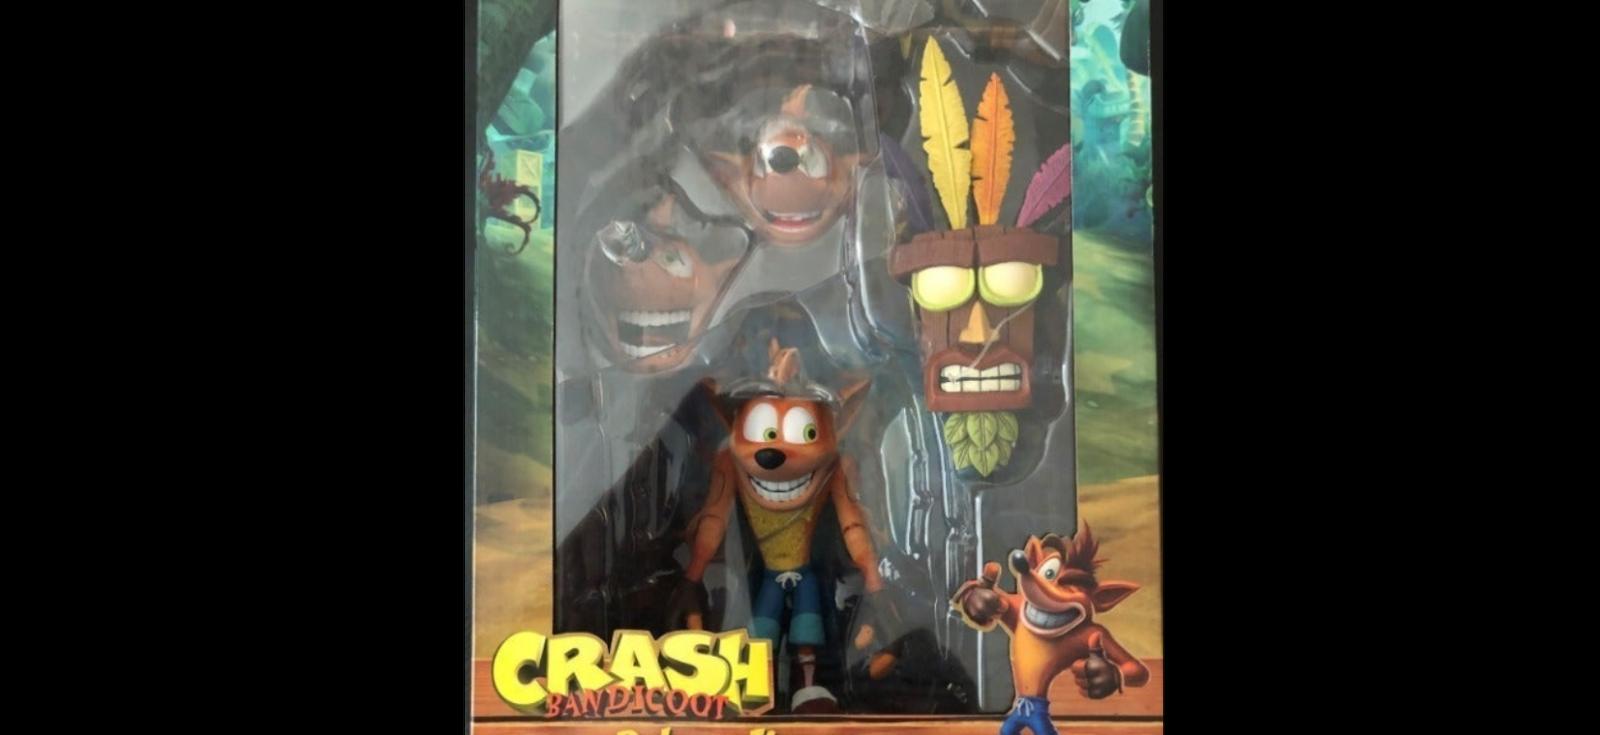 "NECA Deluxe Crash Bandicoot Aku Aku Mask 7"" 41060 NIB - $49.00"